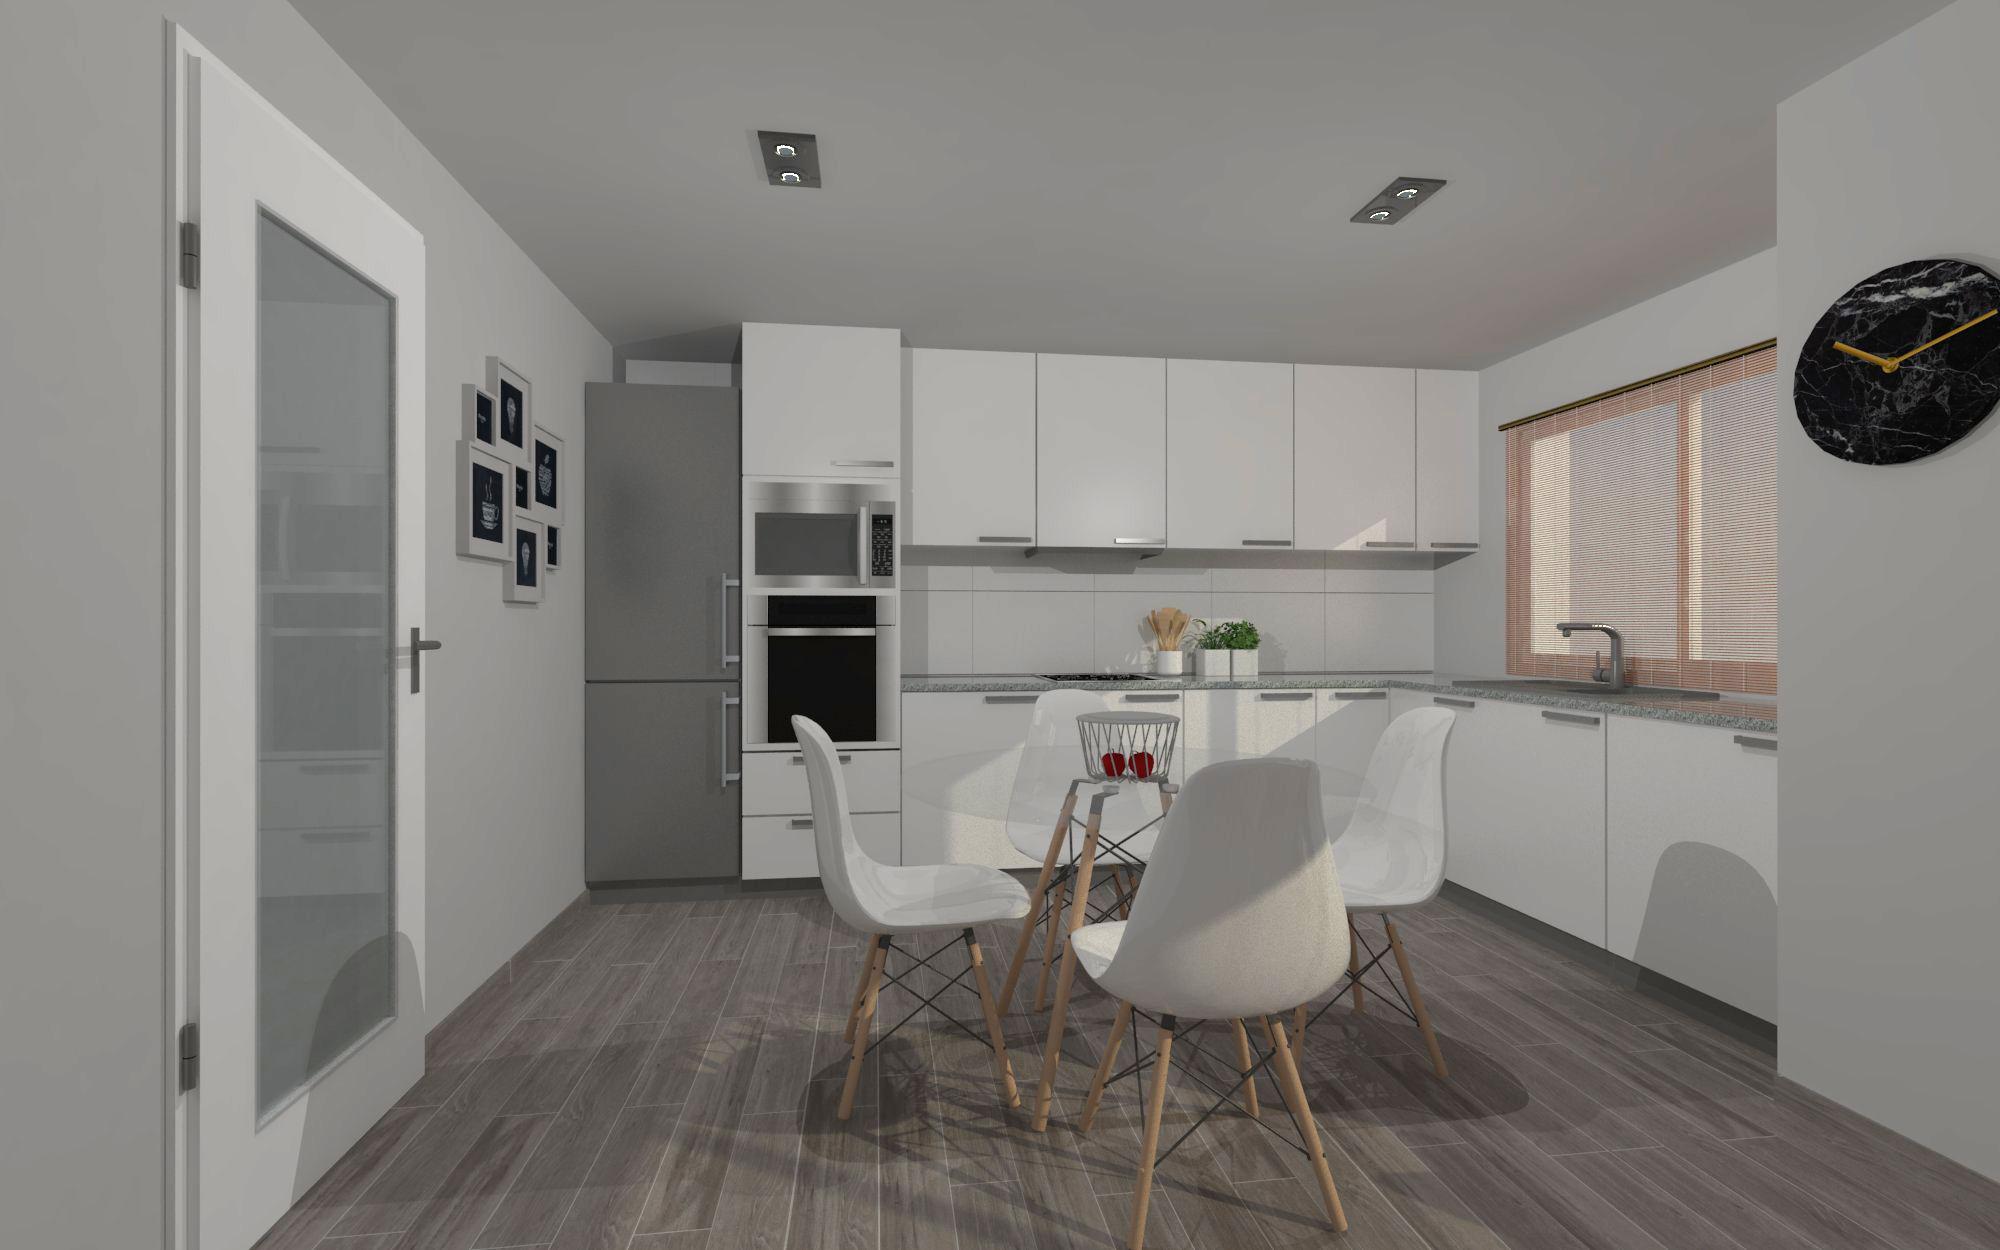 Cocina-salon01.jpg